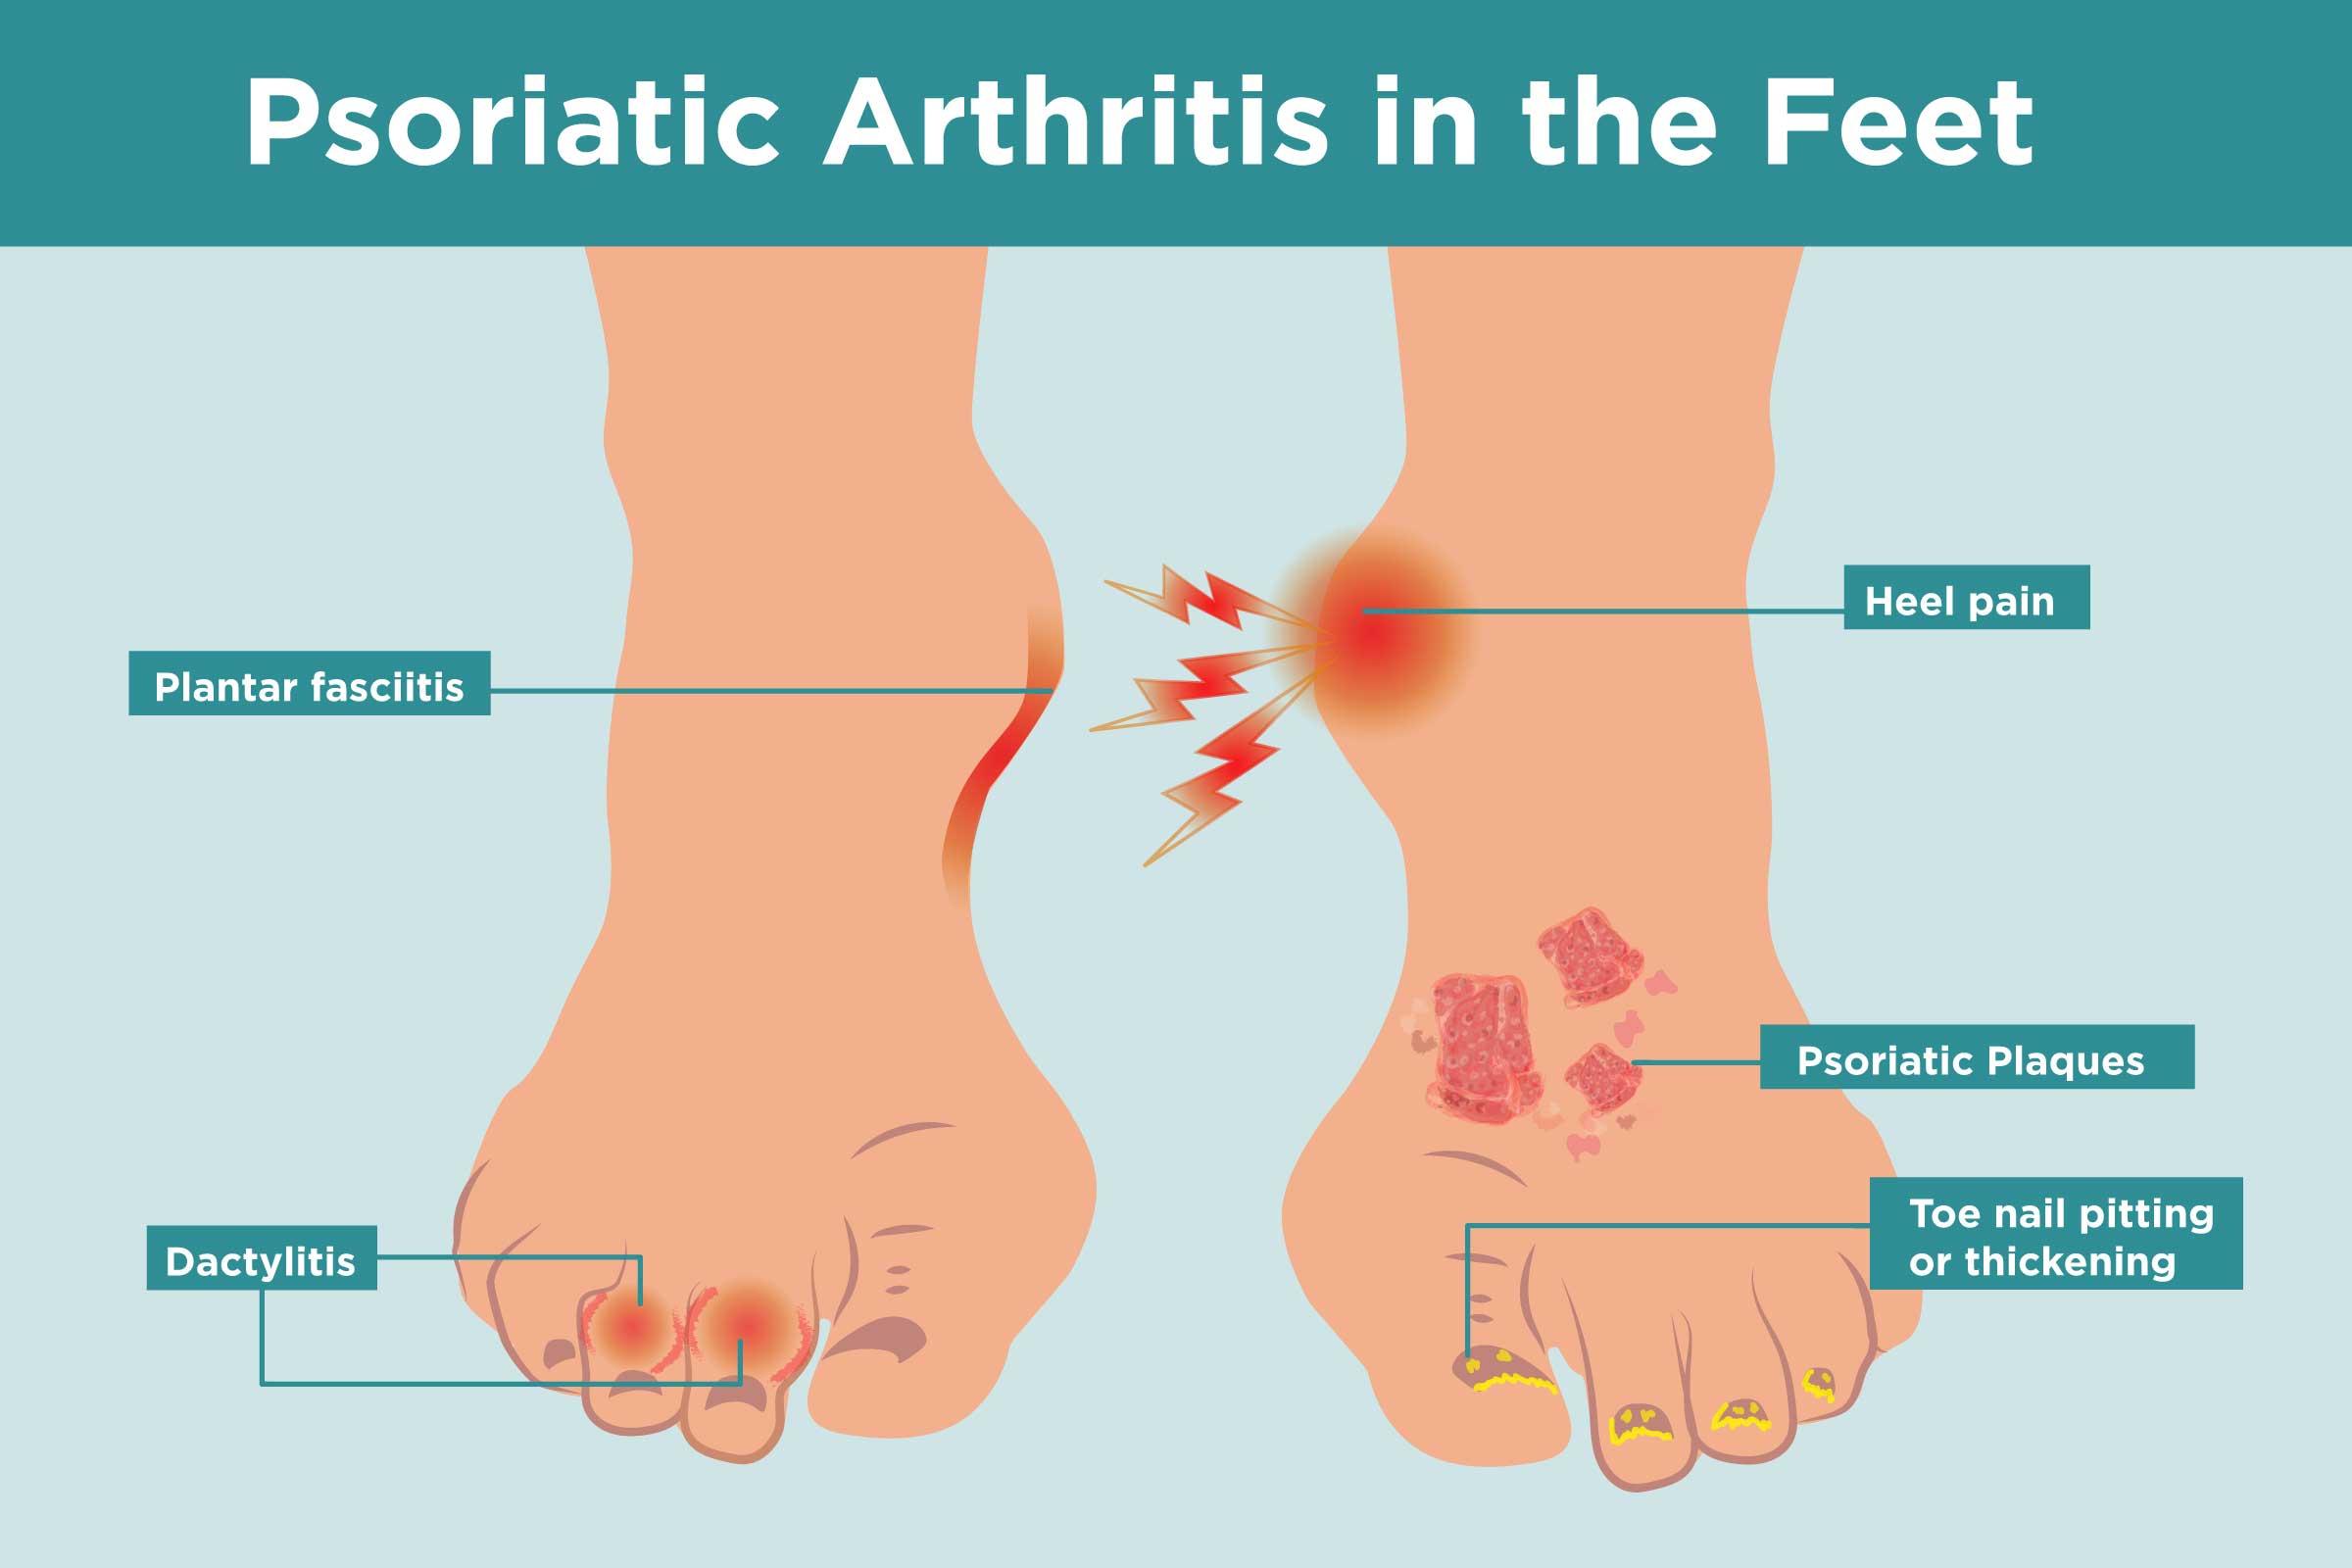 psoriasis on feet help gygynvnyek pikkelysömör ekcma